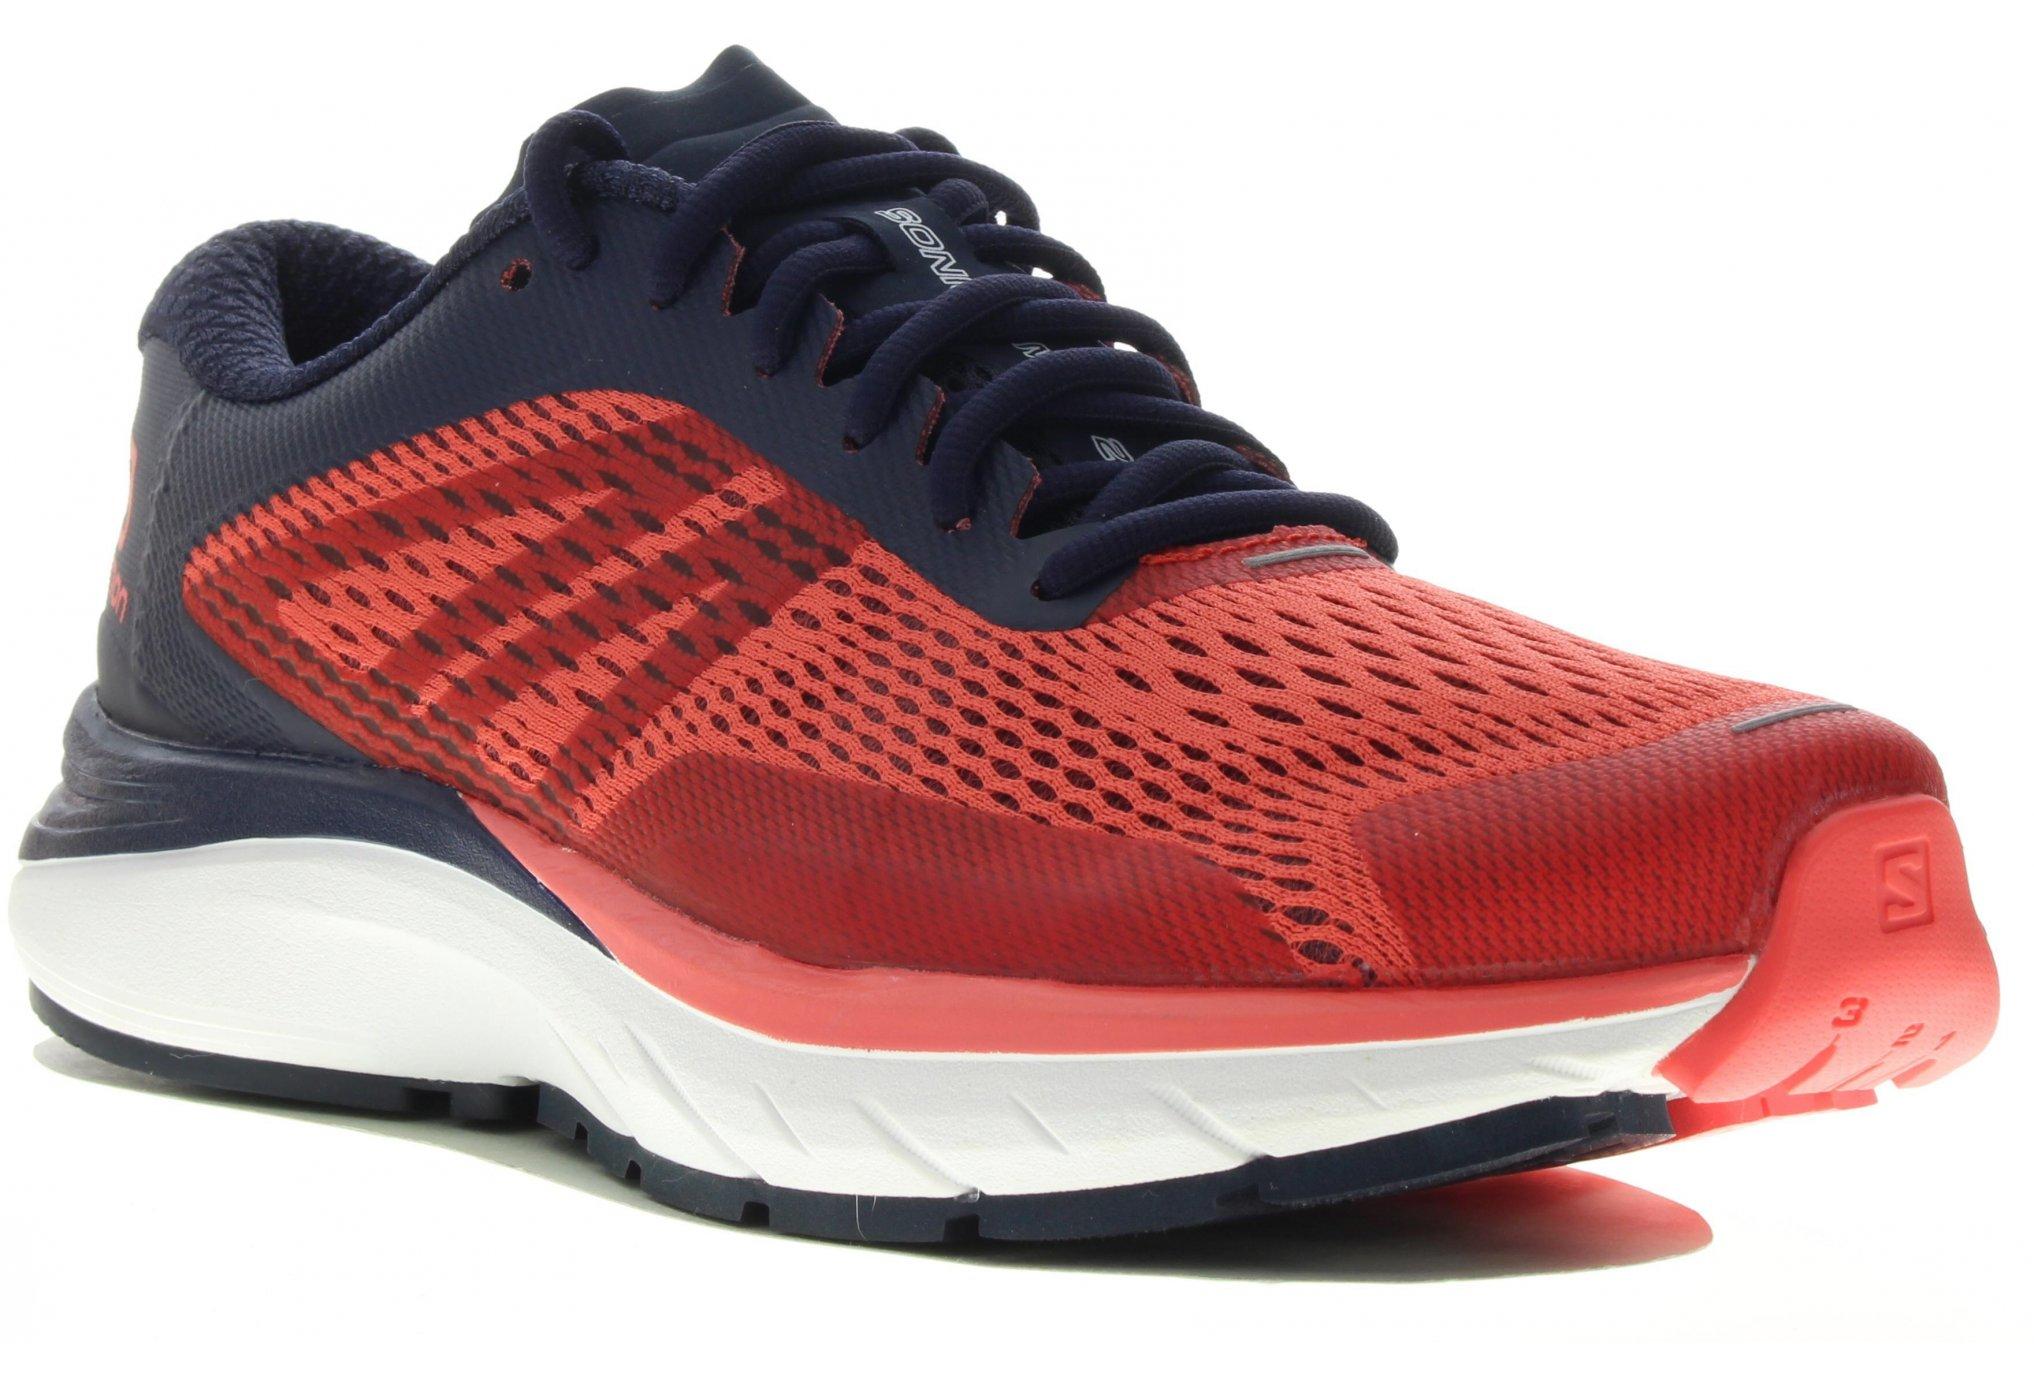 Salomon Sonic RA Max 2 Chaussures running femme